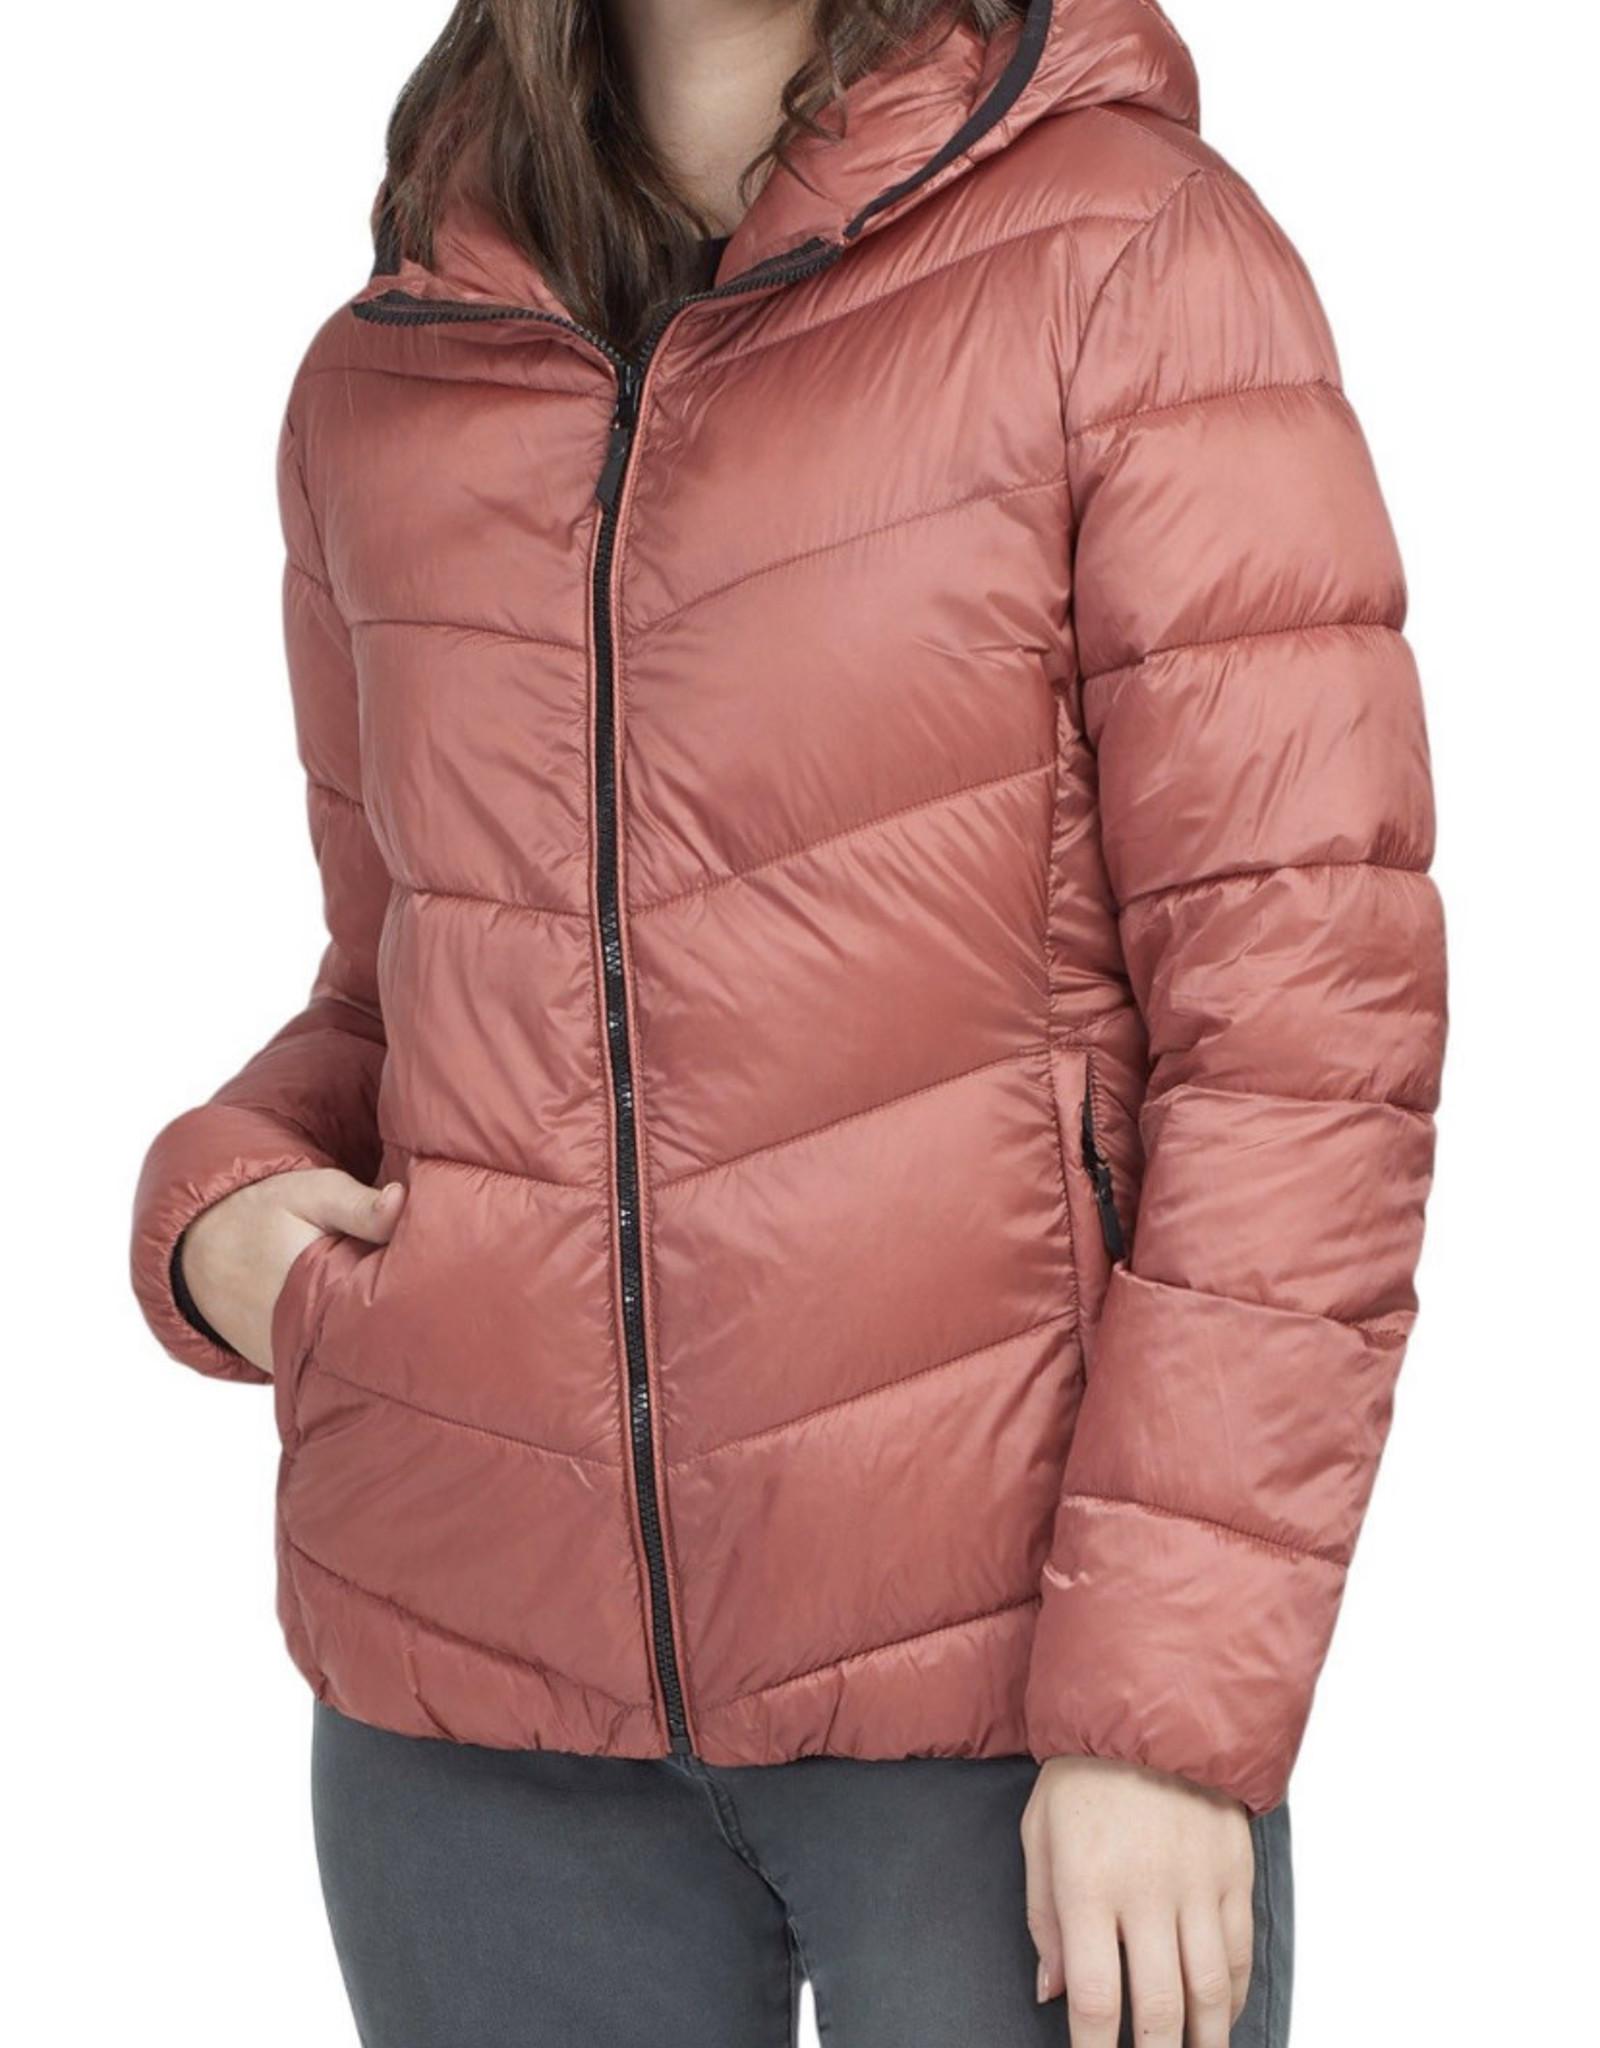 Puffer jacket Tawny